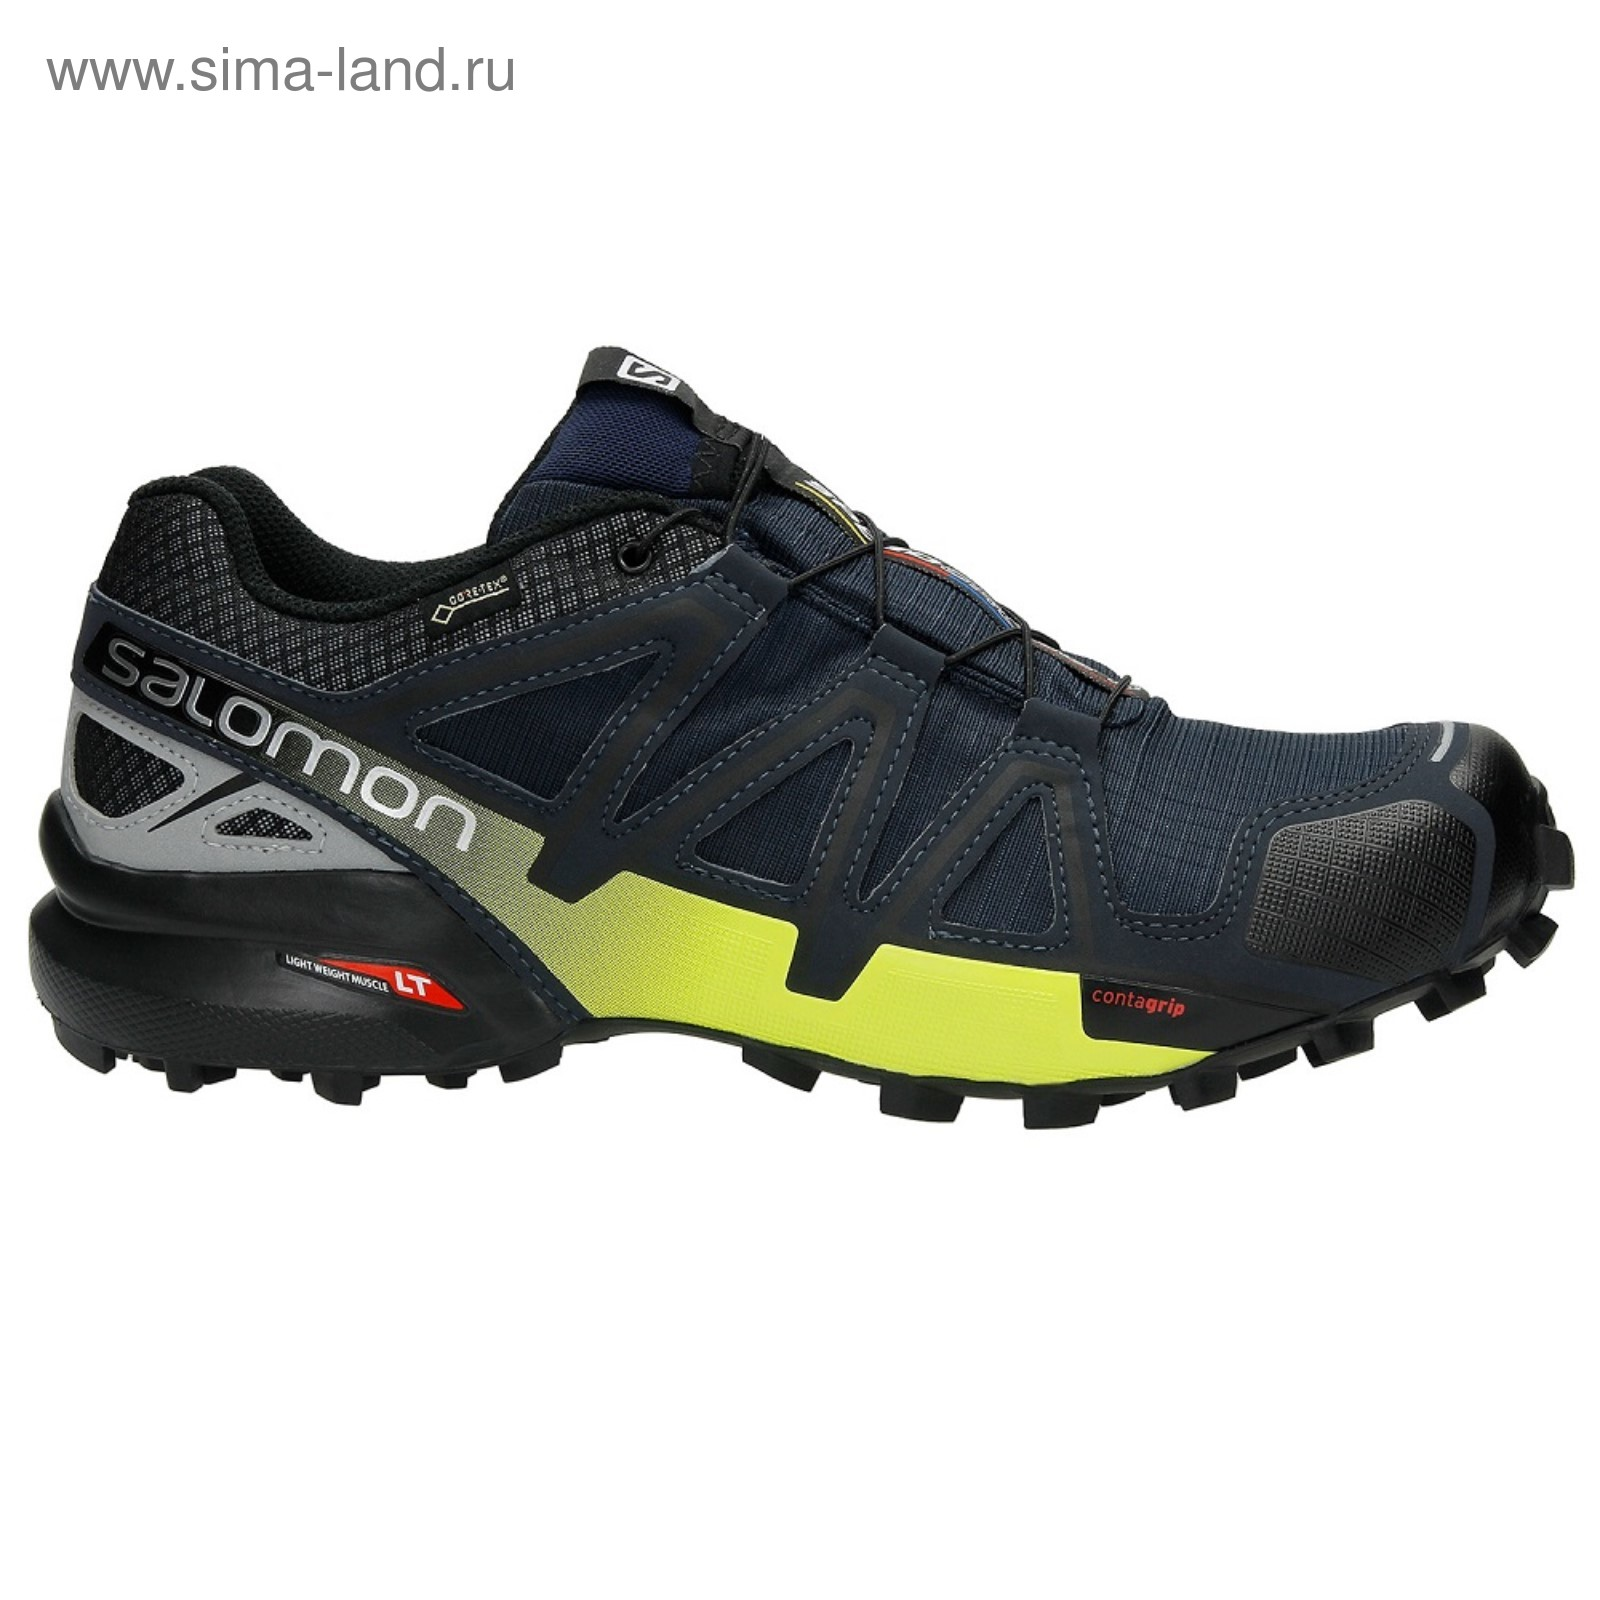 46598af8 Кроссовки SALOMON L39445600 SPEEDCROSS 4 NOCTURNE GTX 9,5 (2837049 ...